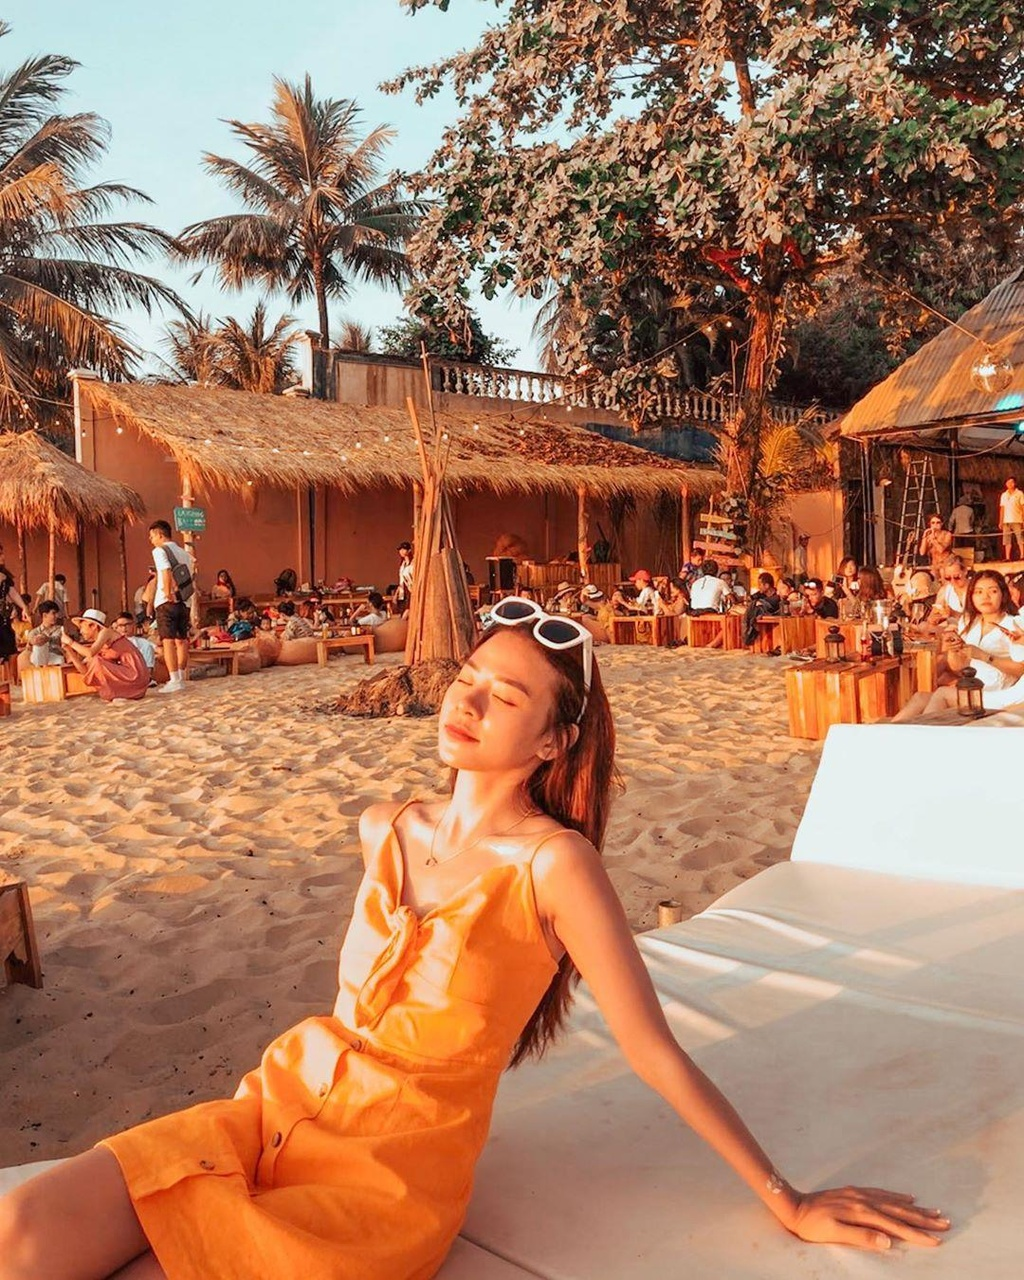 Den beach bar ngam hoang hon Phu Quoc tuyet dep hinh anh 6